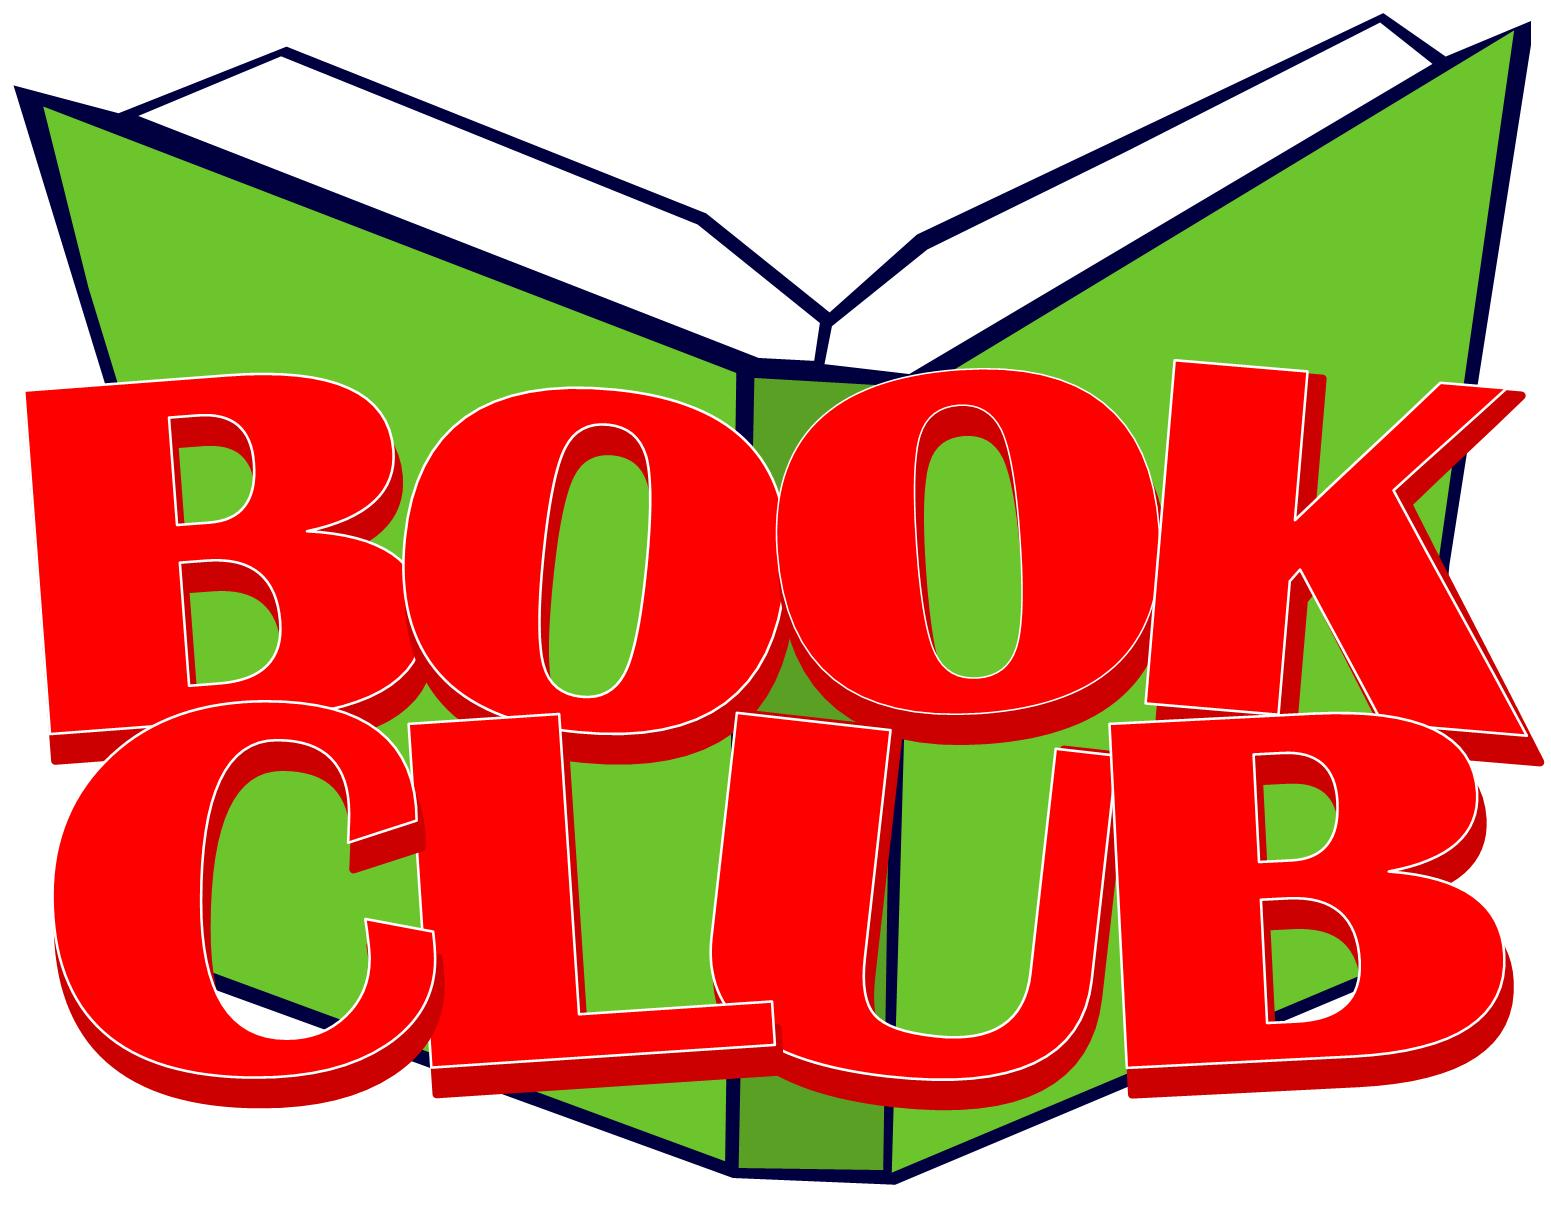 Club clipart student Cliparts Clubs Cliparts Art Club